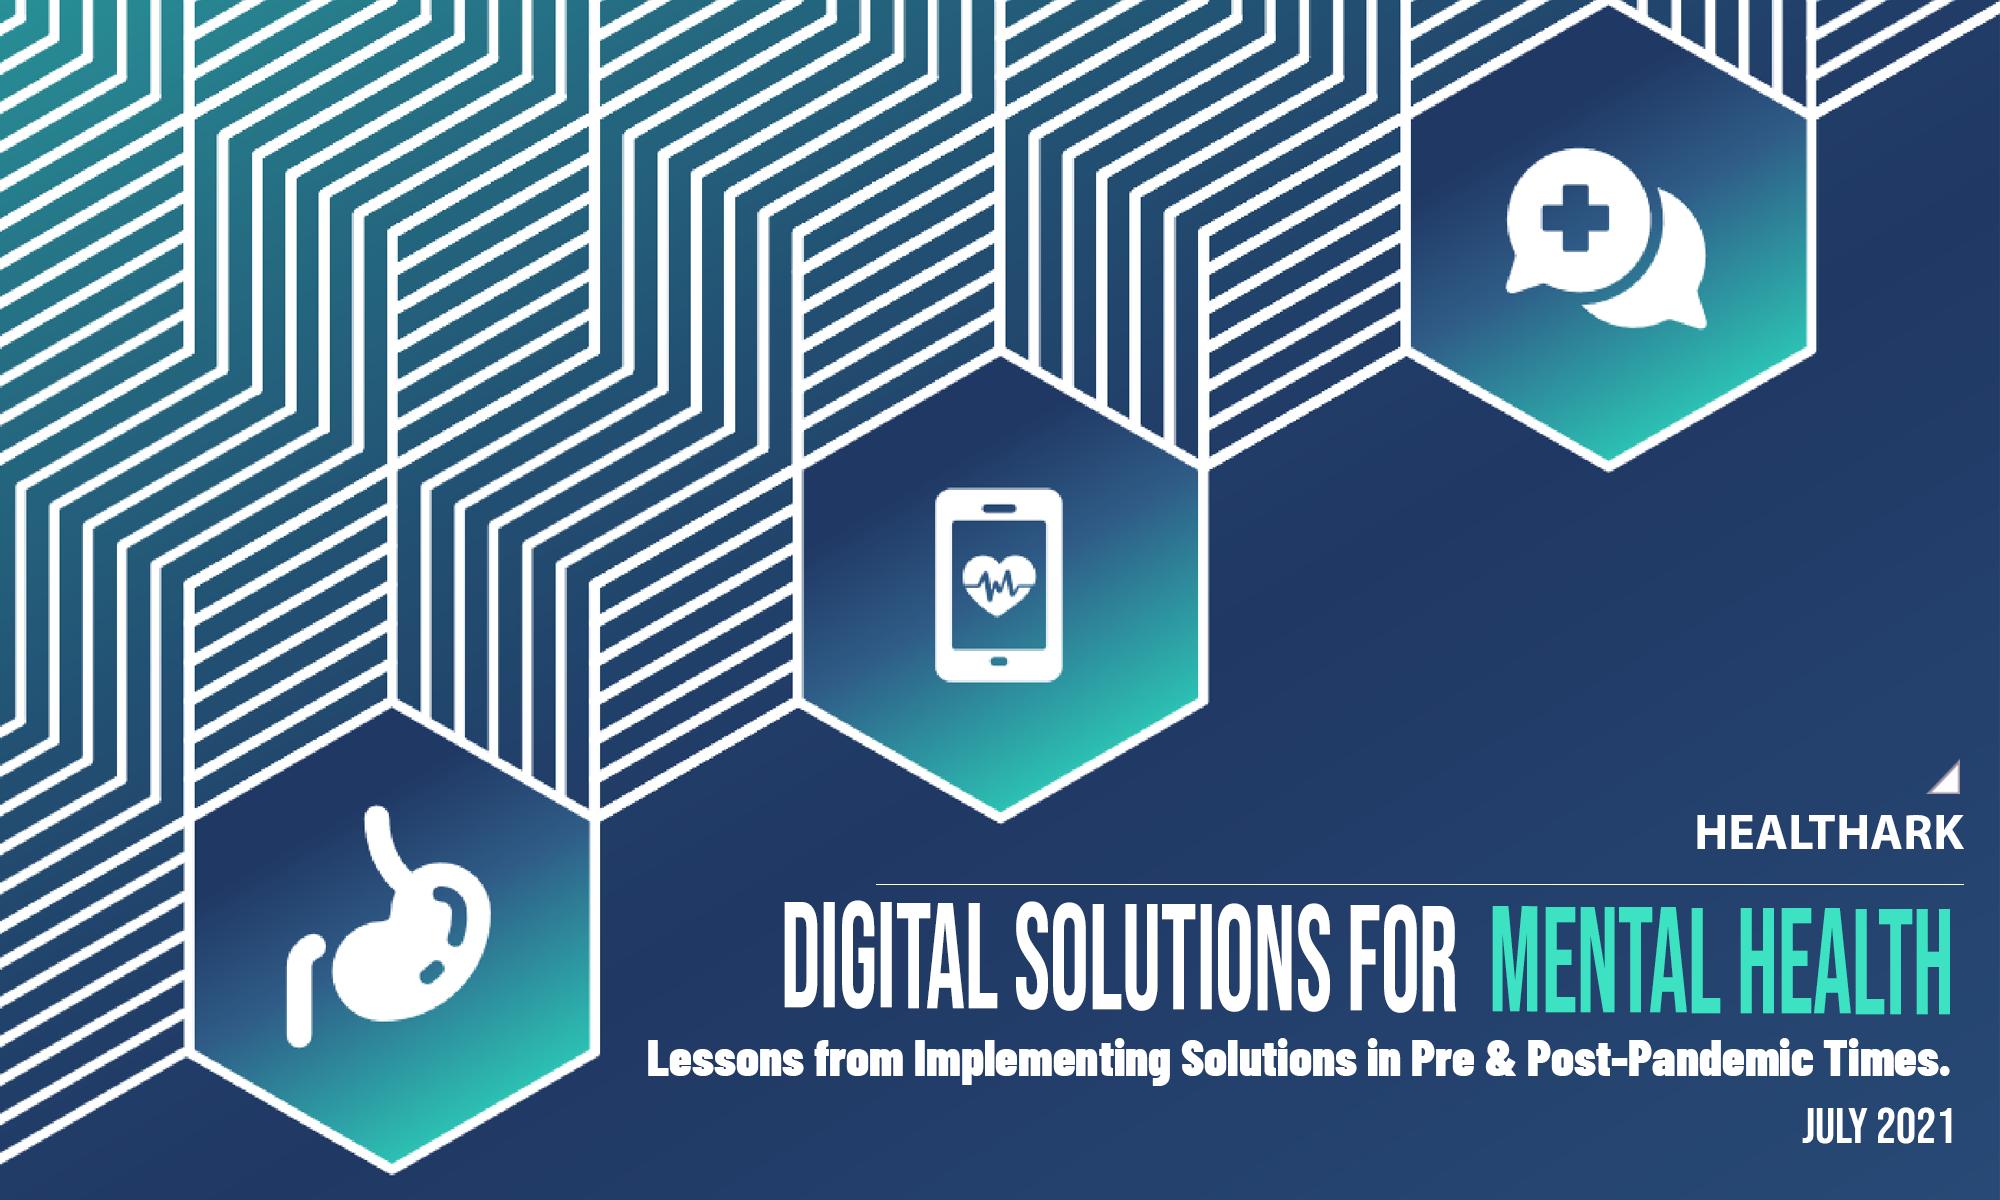 Digital Solutions for MENTAL HEALTH